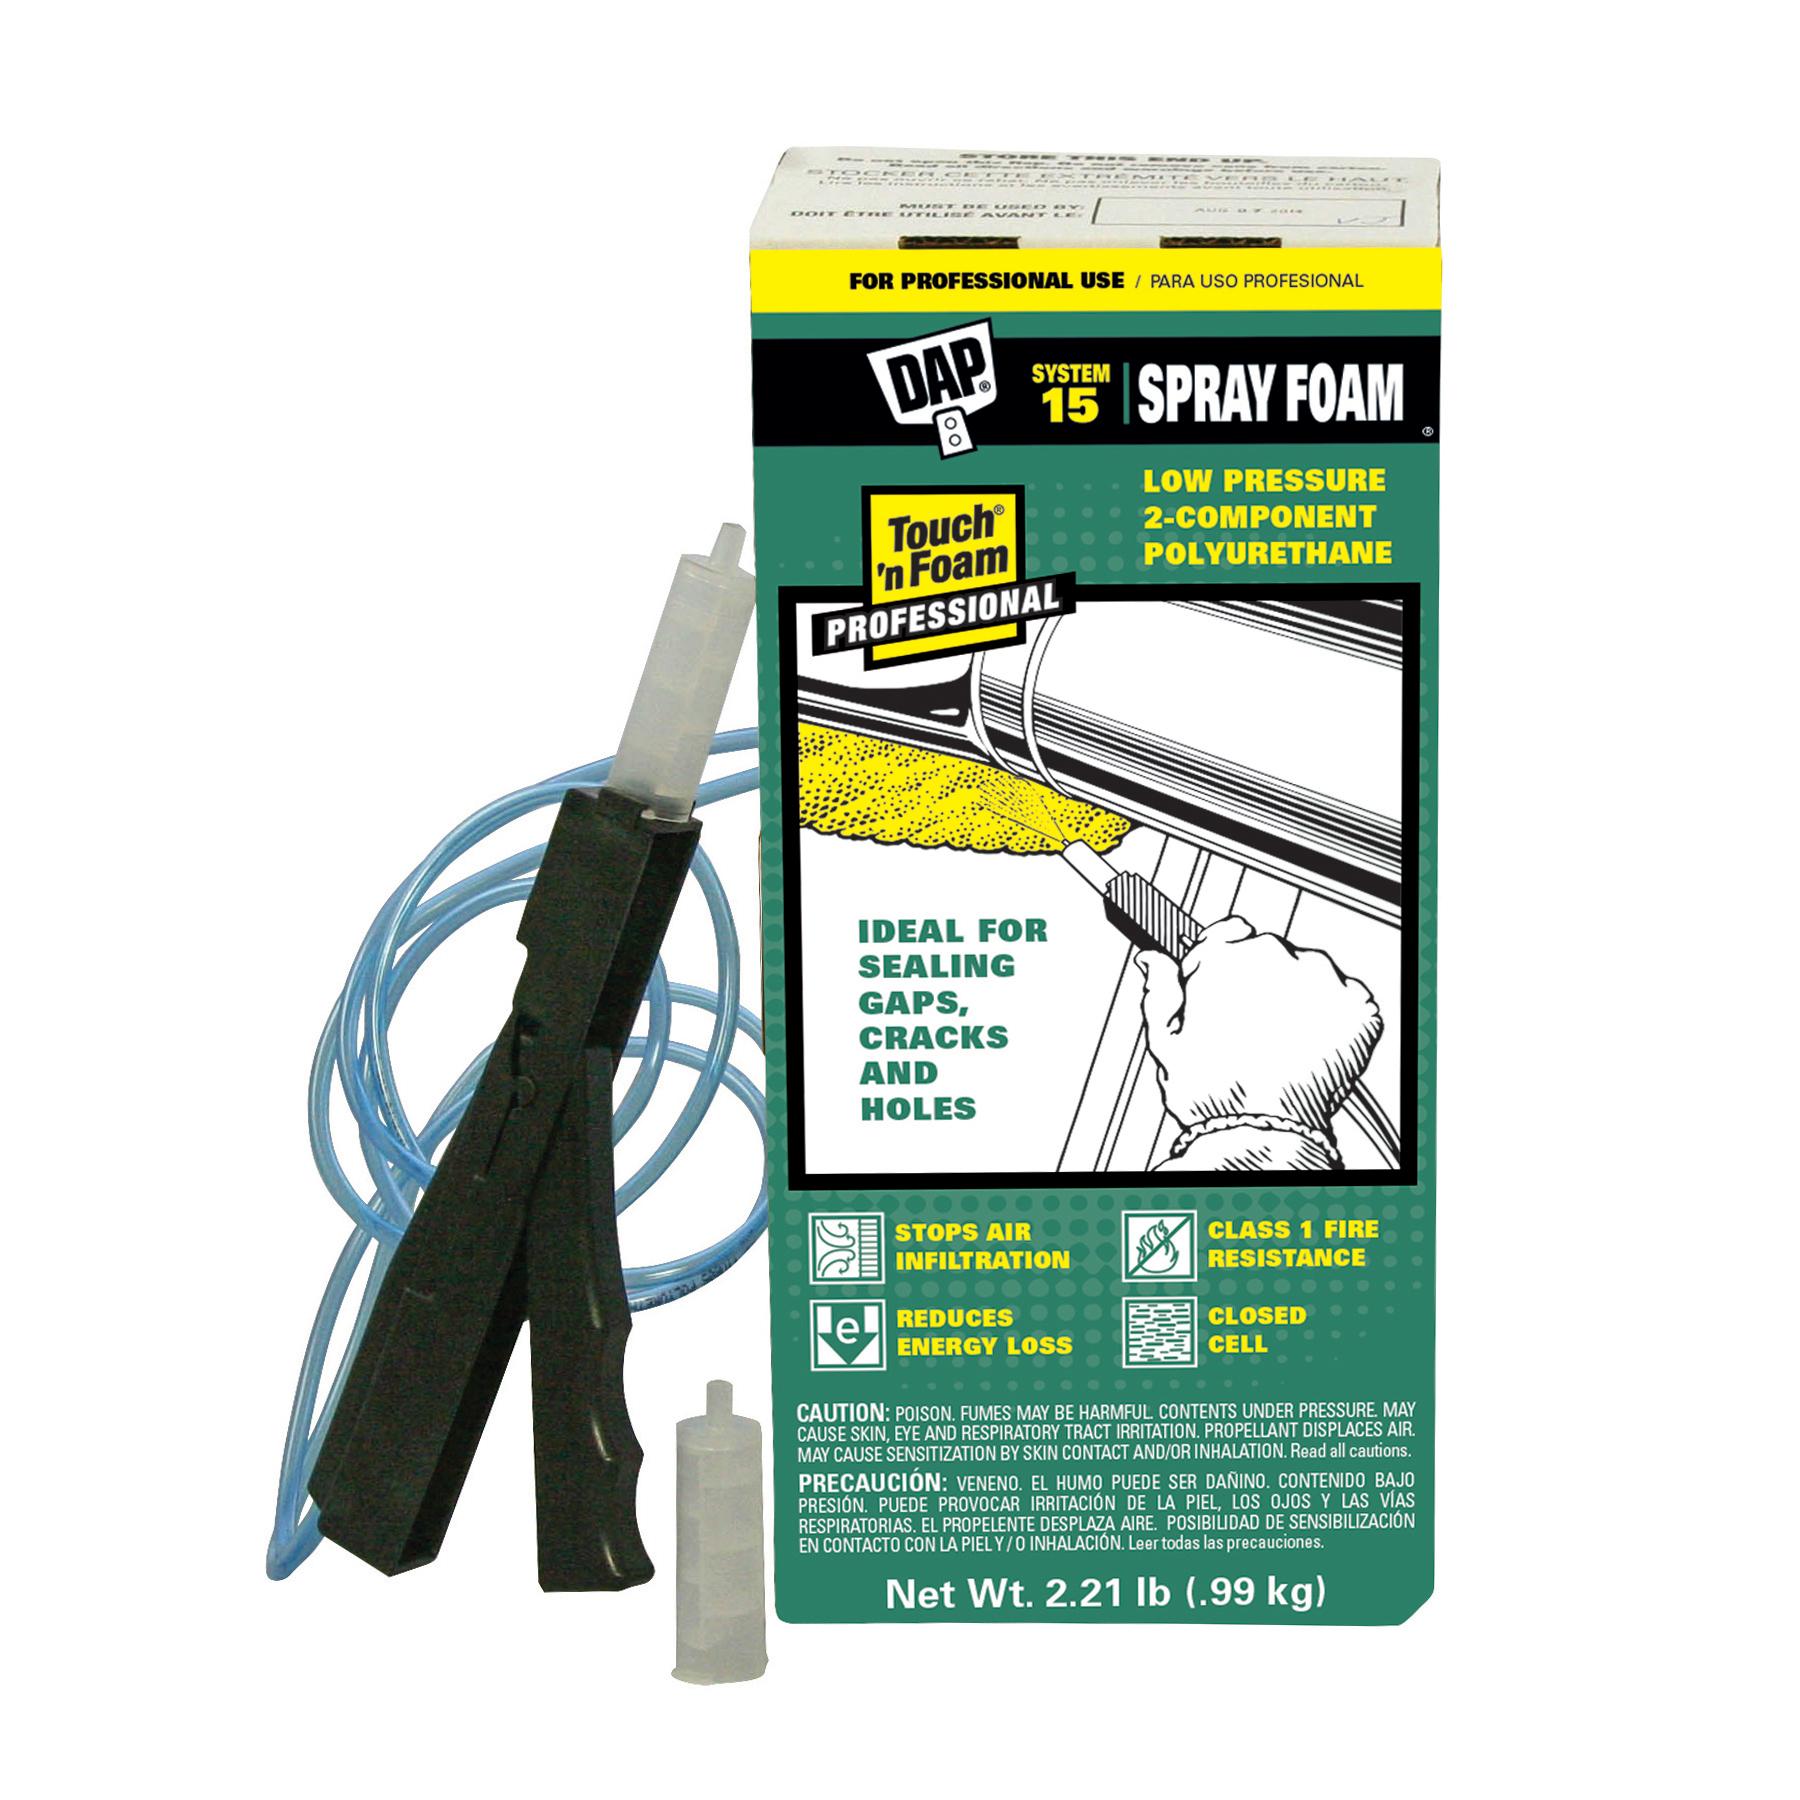 Touch N Foam System 15 Spray Foam Insulation Kit